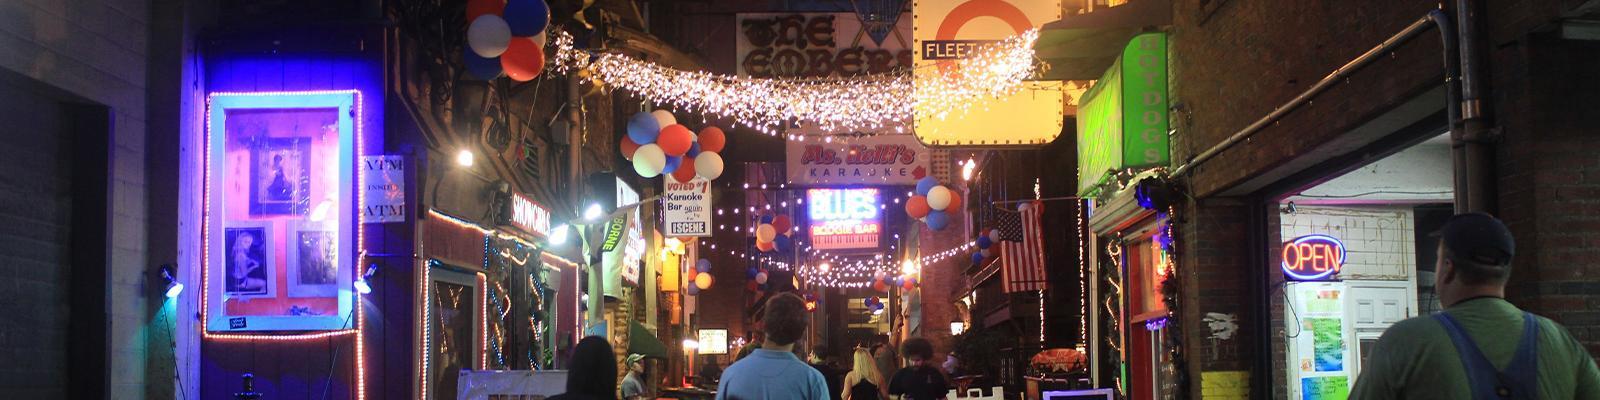 Nashville's nightlife lit by neon signs